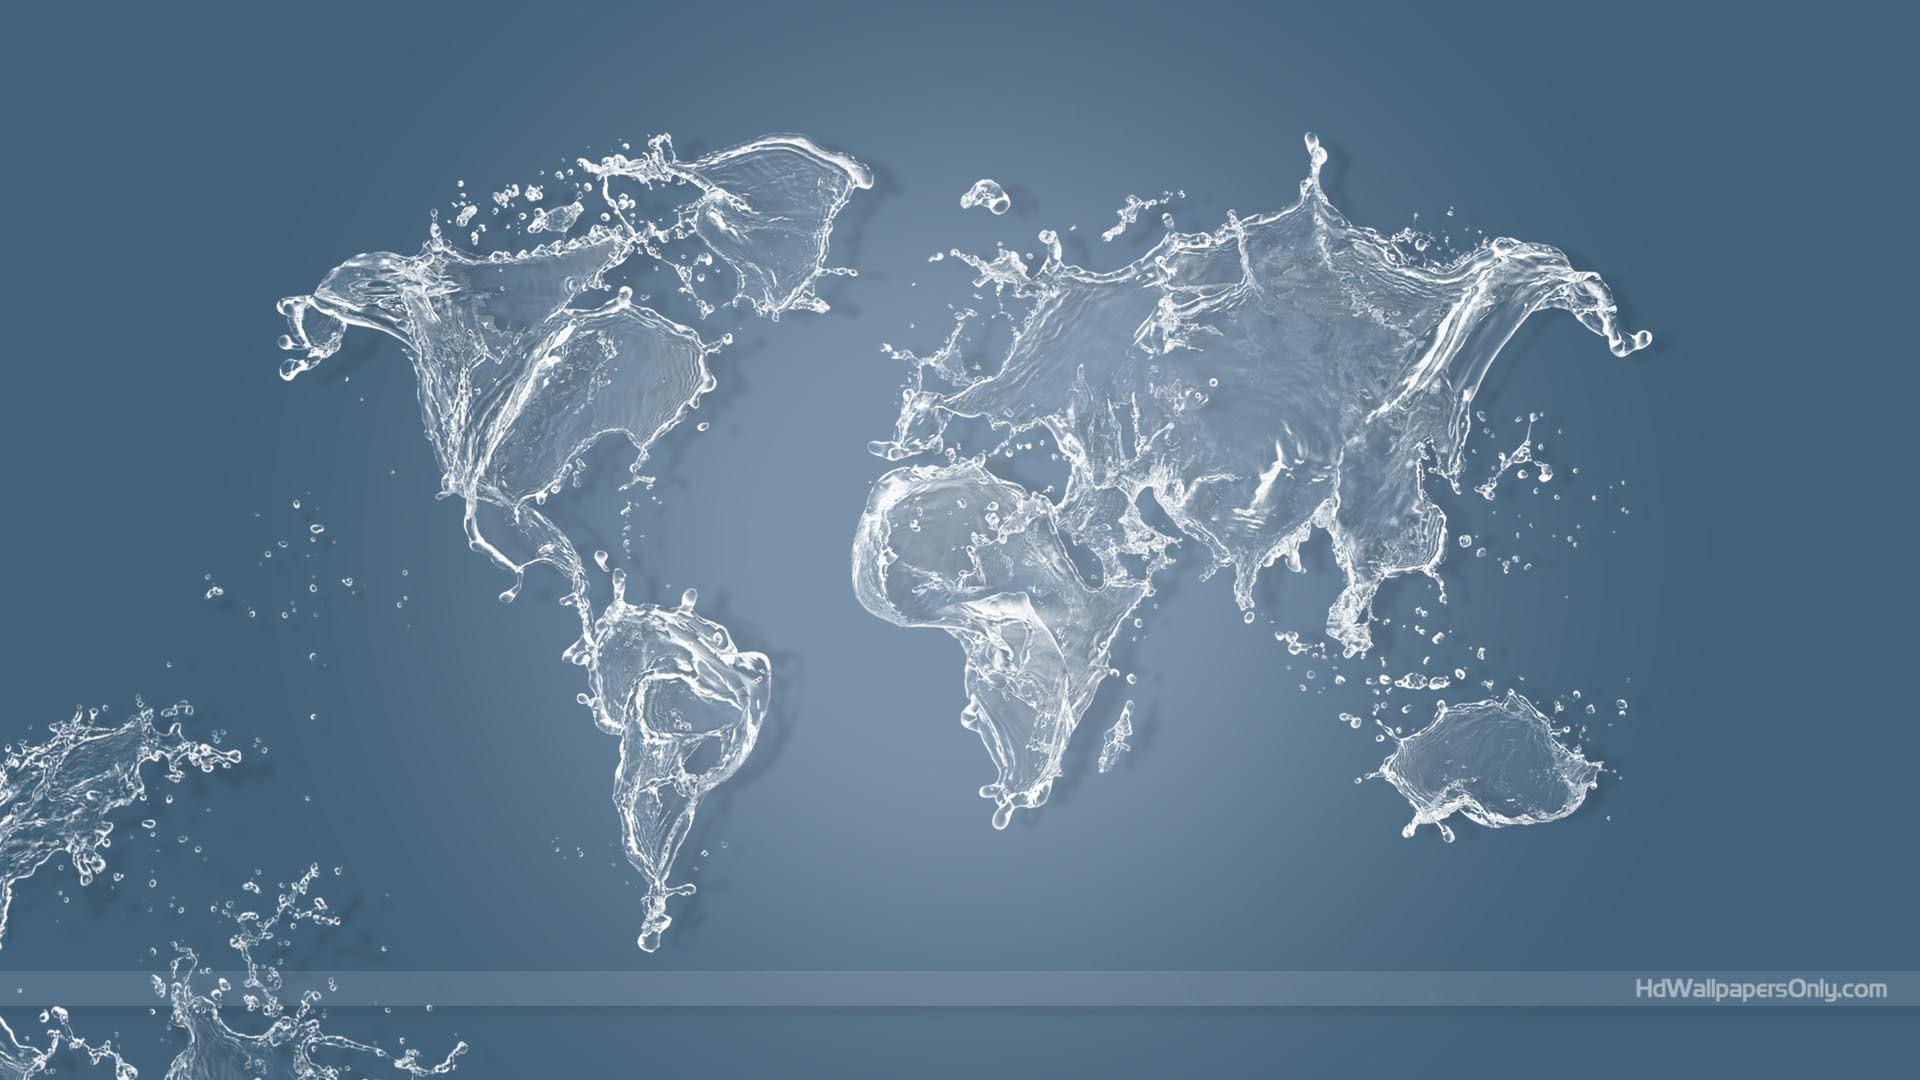 World map k hd desktop wallpaper for k ultra hd tv wide gumiabroncs Images